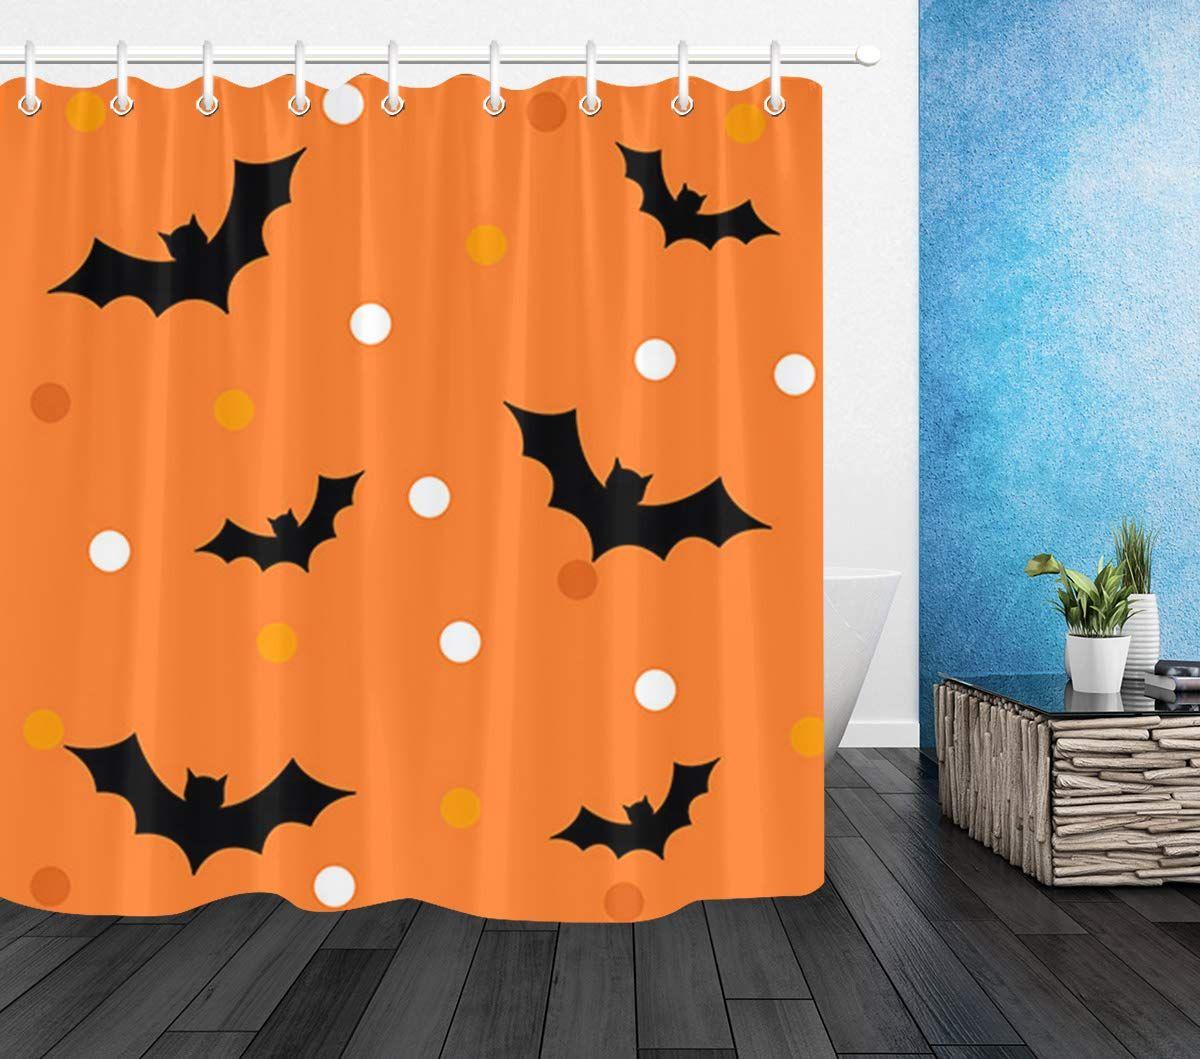 Lb Simple Design Black Bat Shower Curtain Set For Bathrooms Black